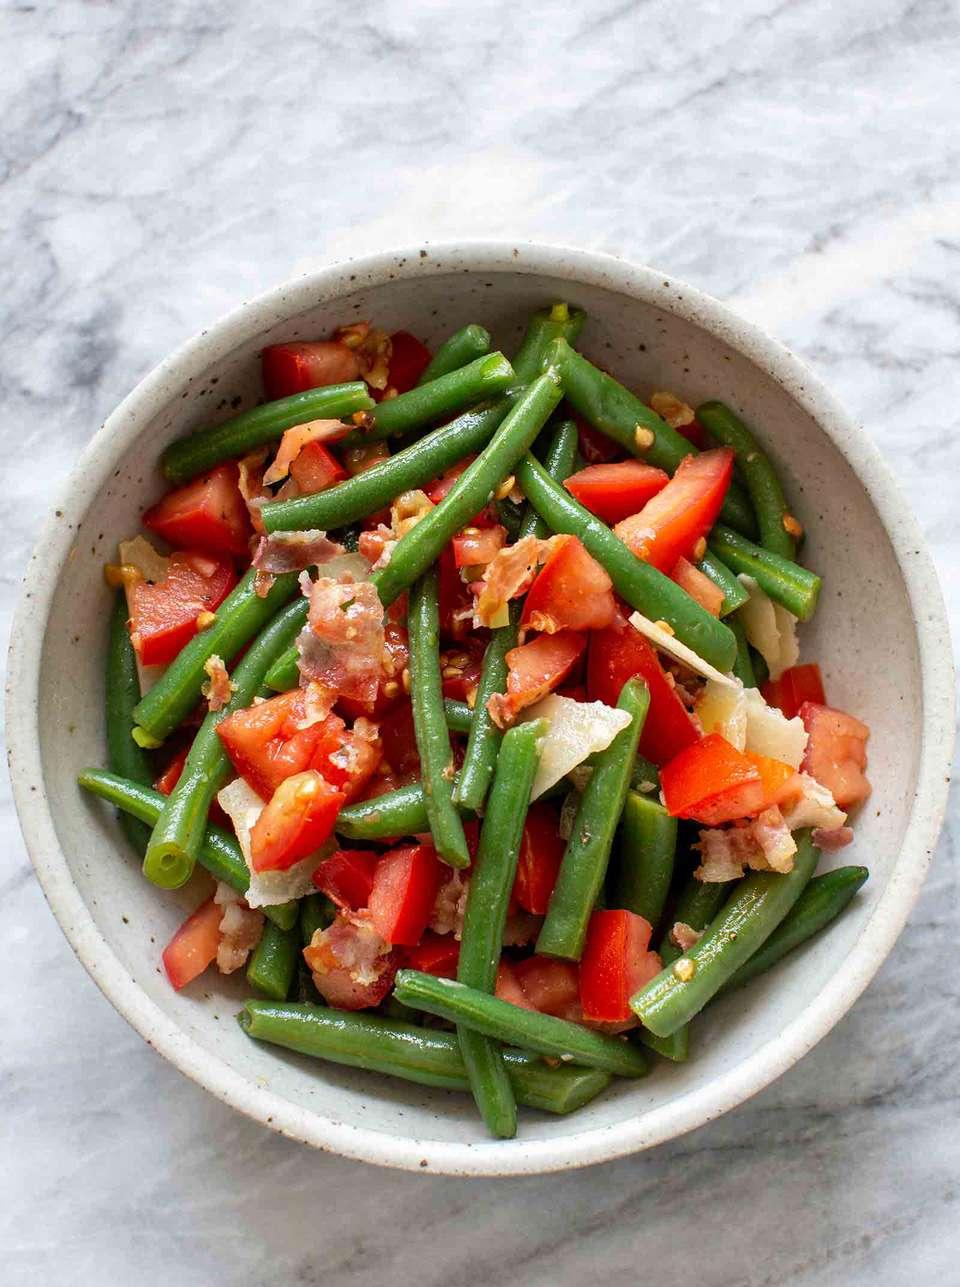 Warm Green Bean and Pancetta Salad